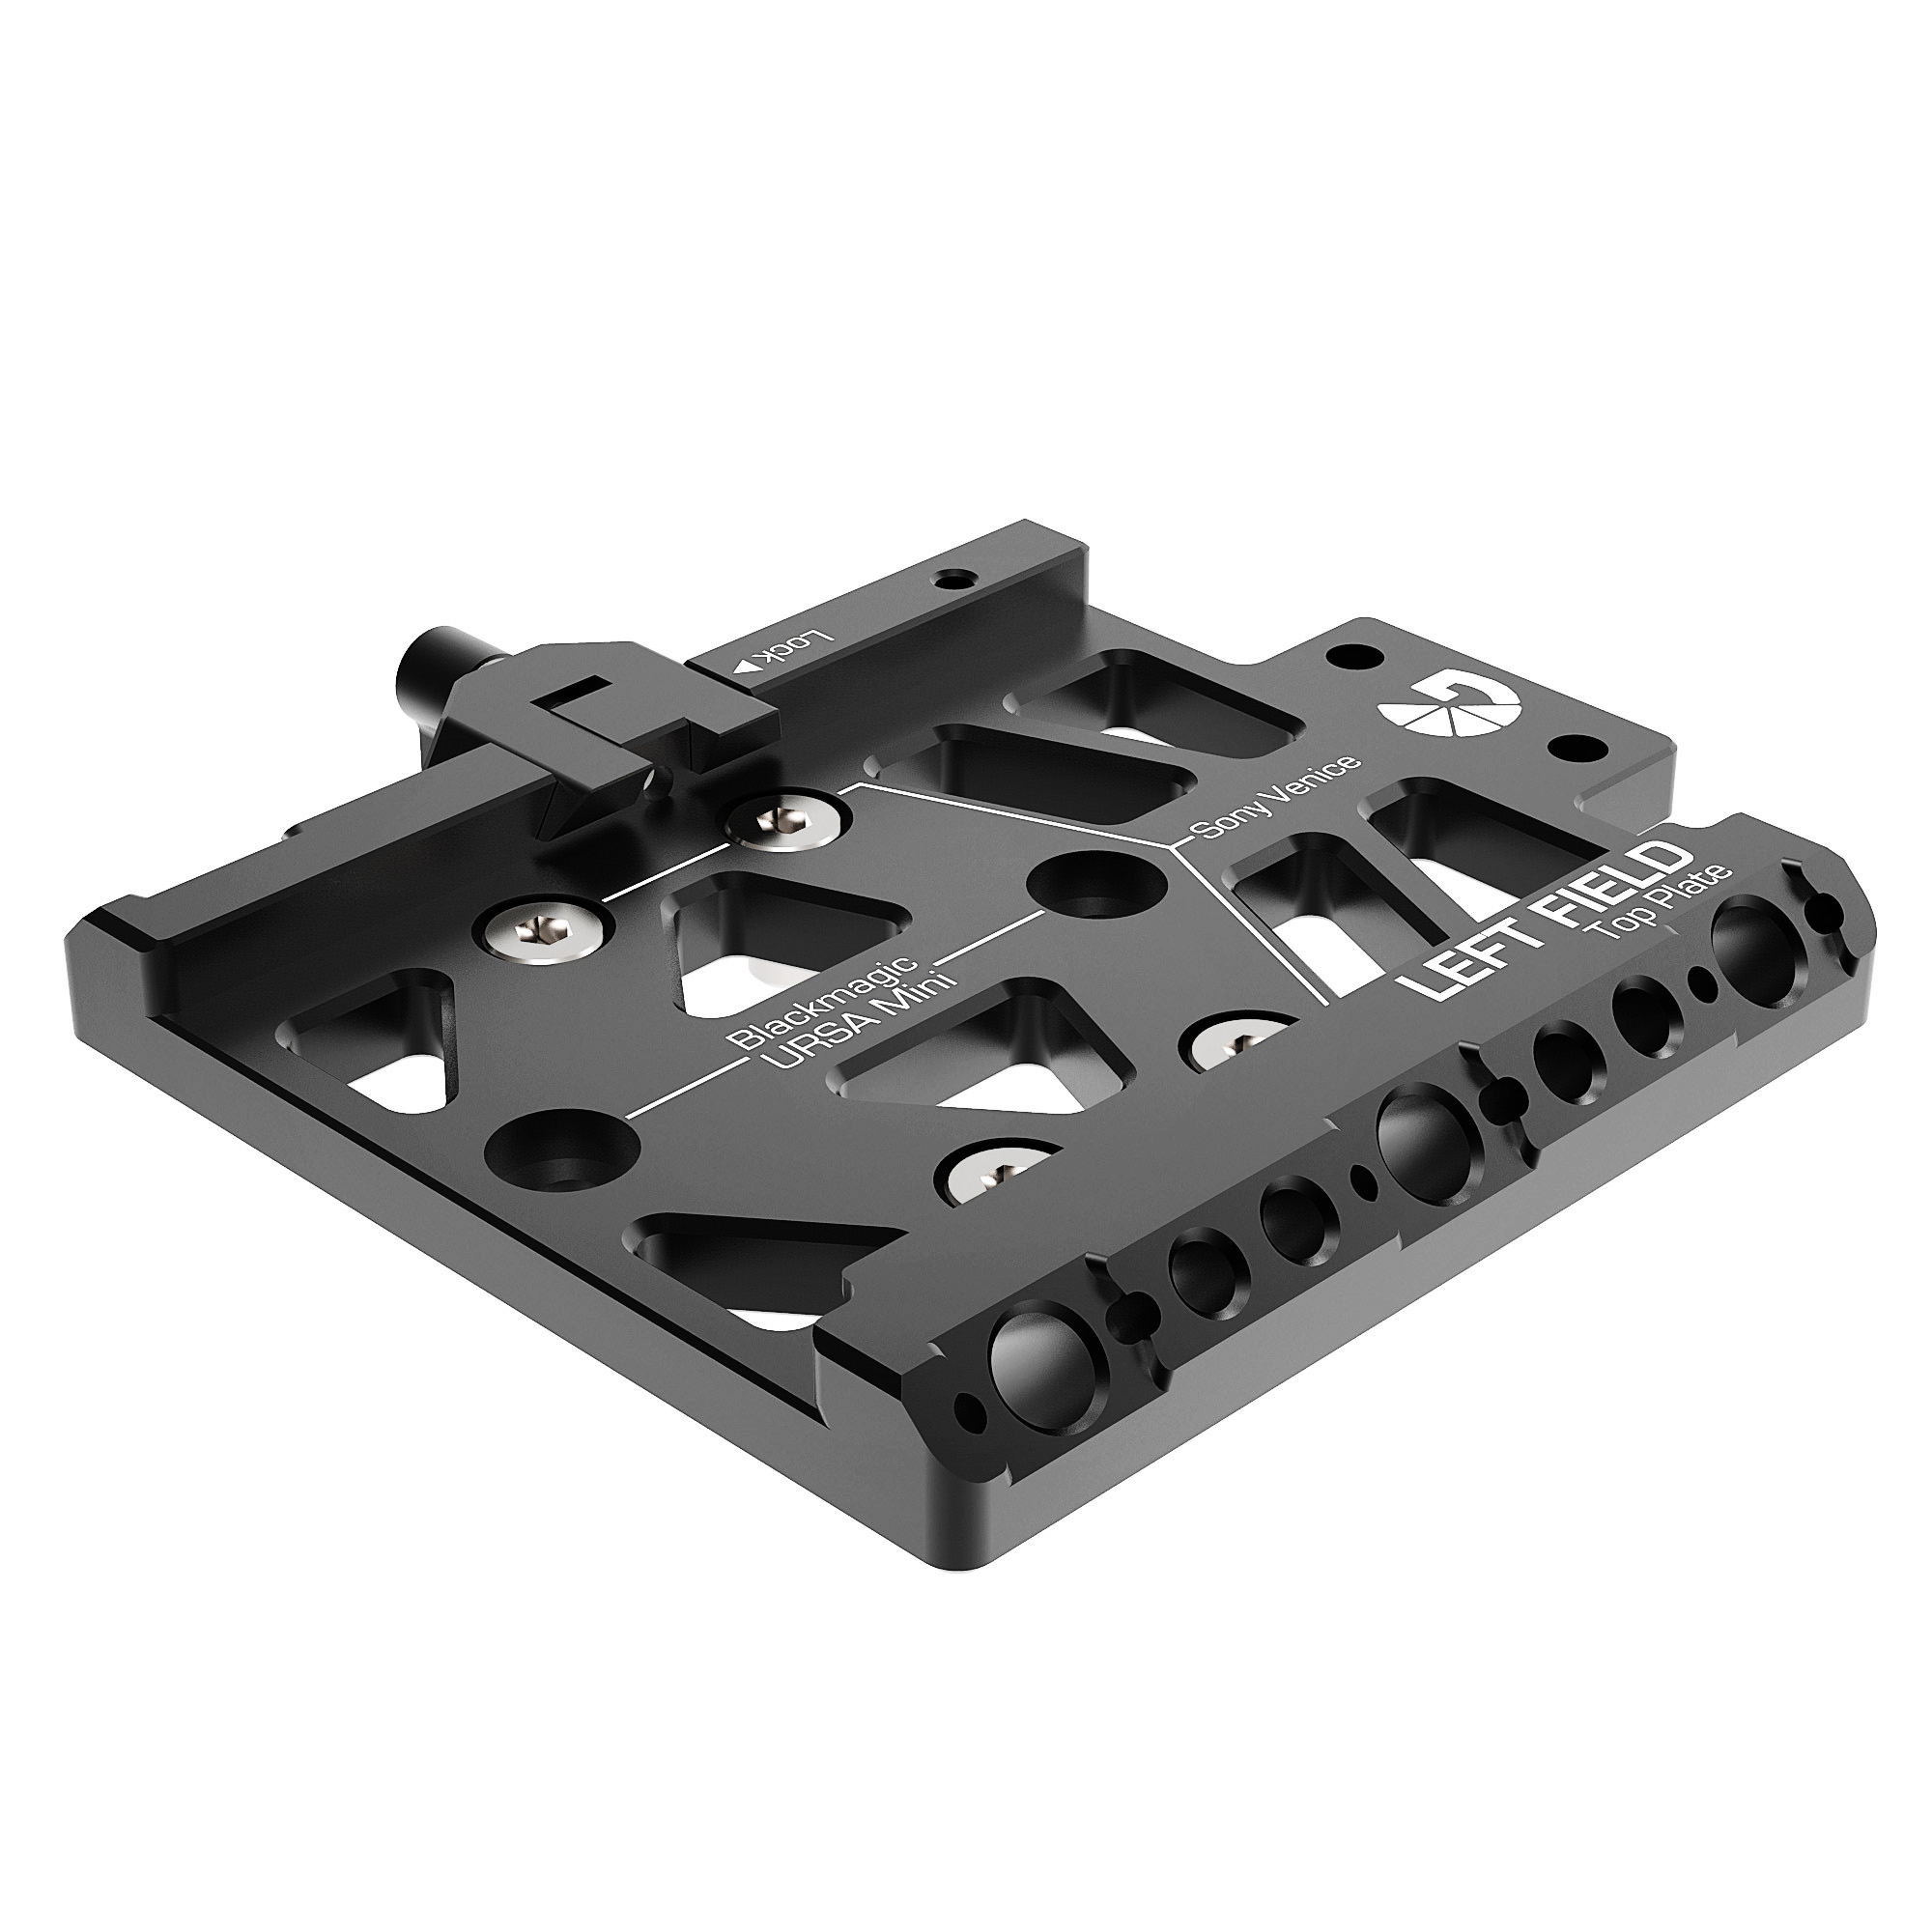 B4004 1002 Sony Venice Sliding Top Plate Core 1